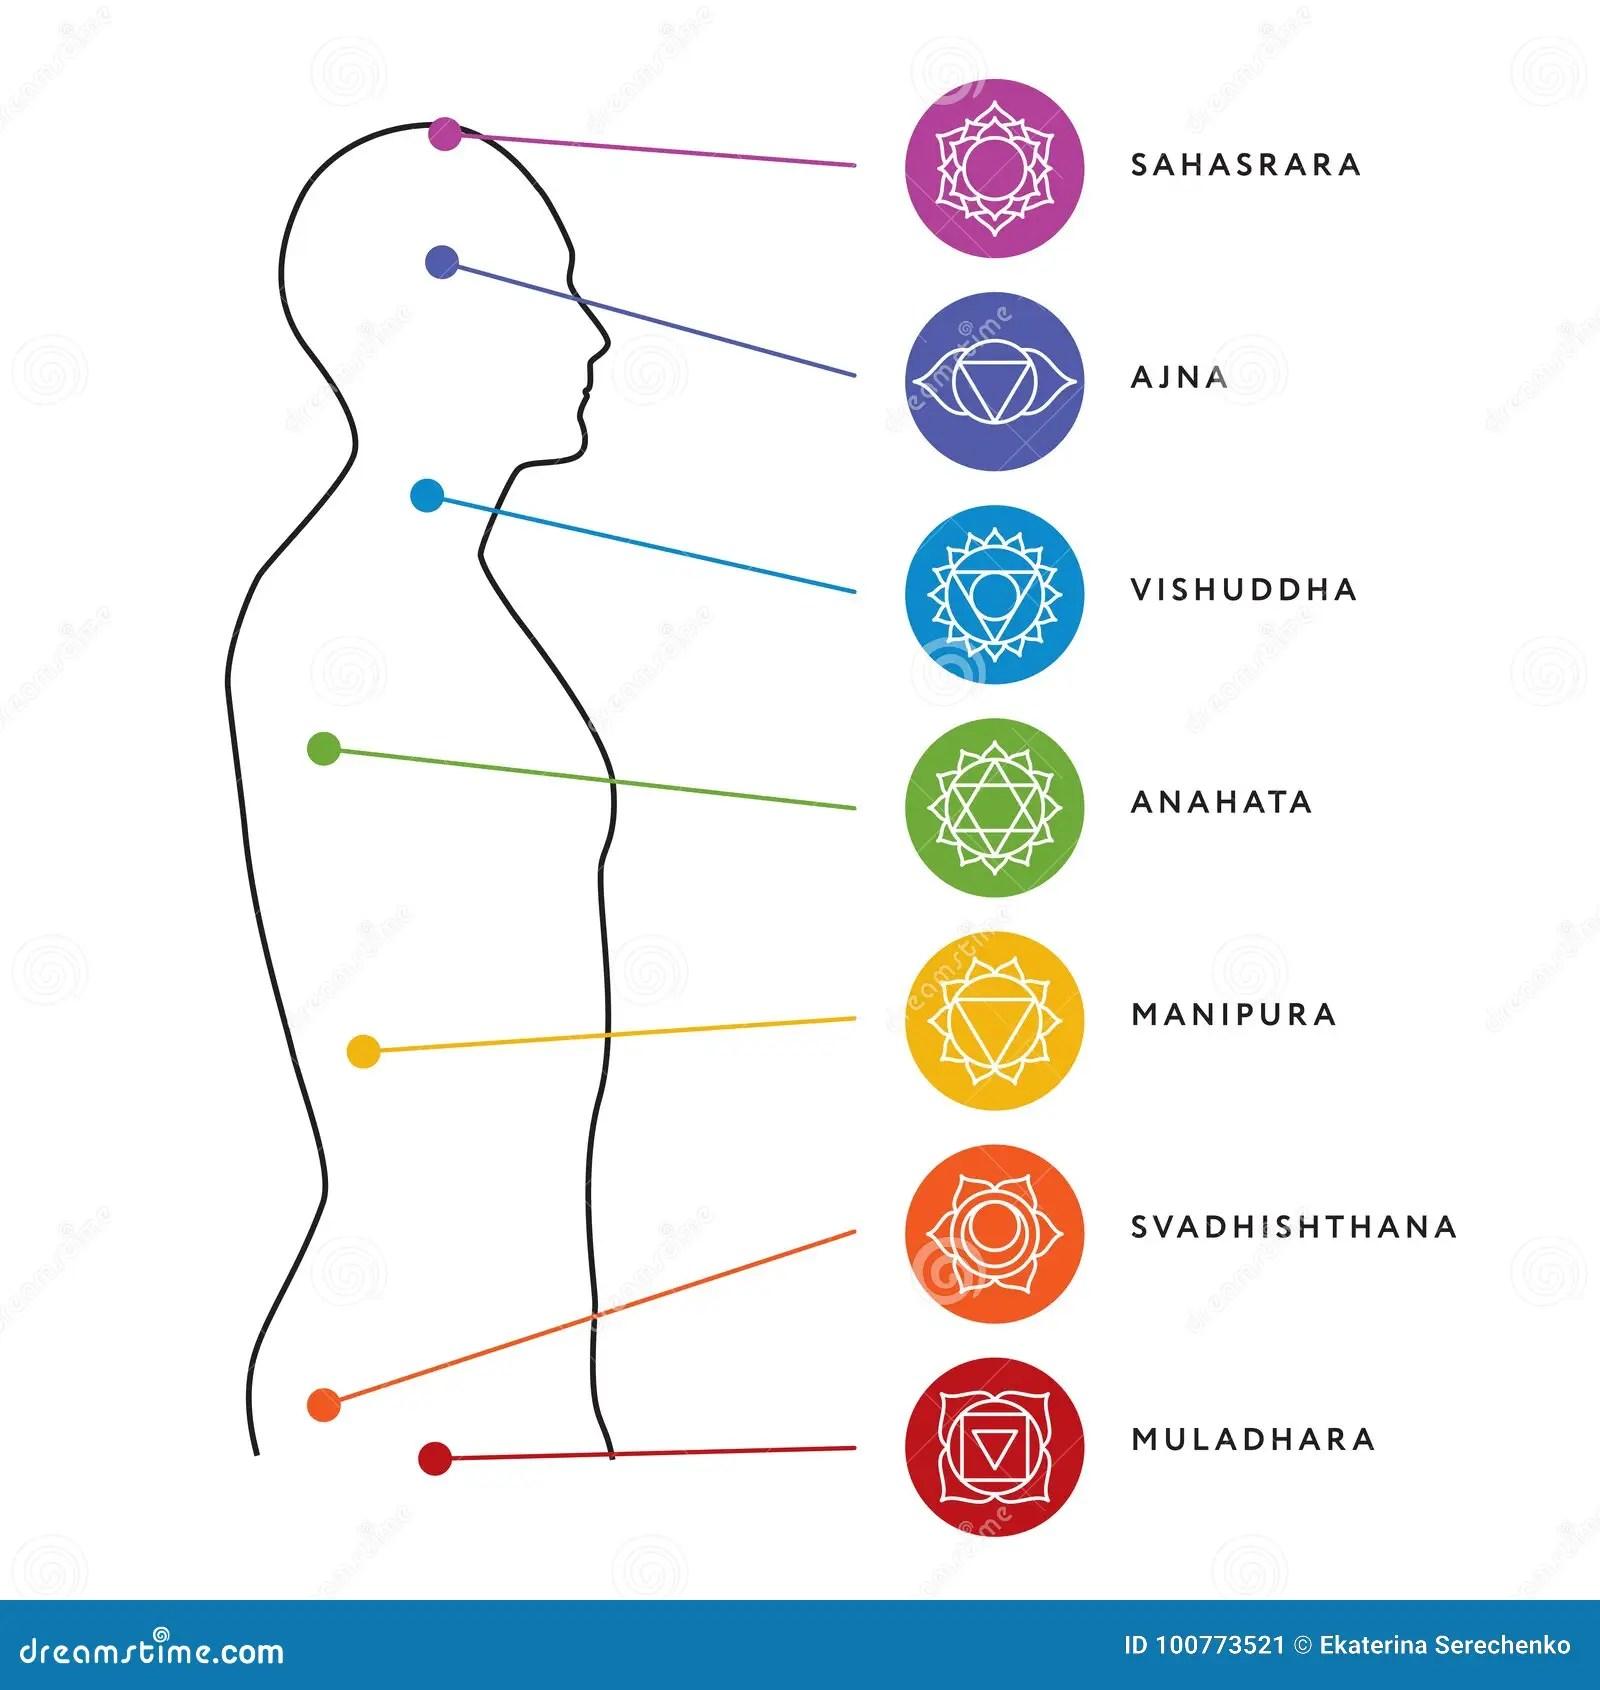 hight resolution of chakra system of human body chart seven chakra symbols location information of each chakra chakra centers